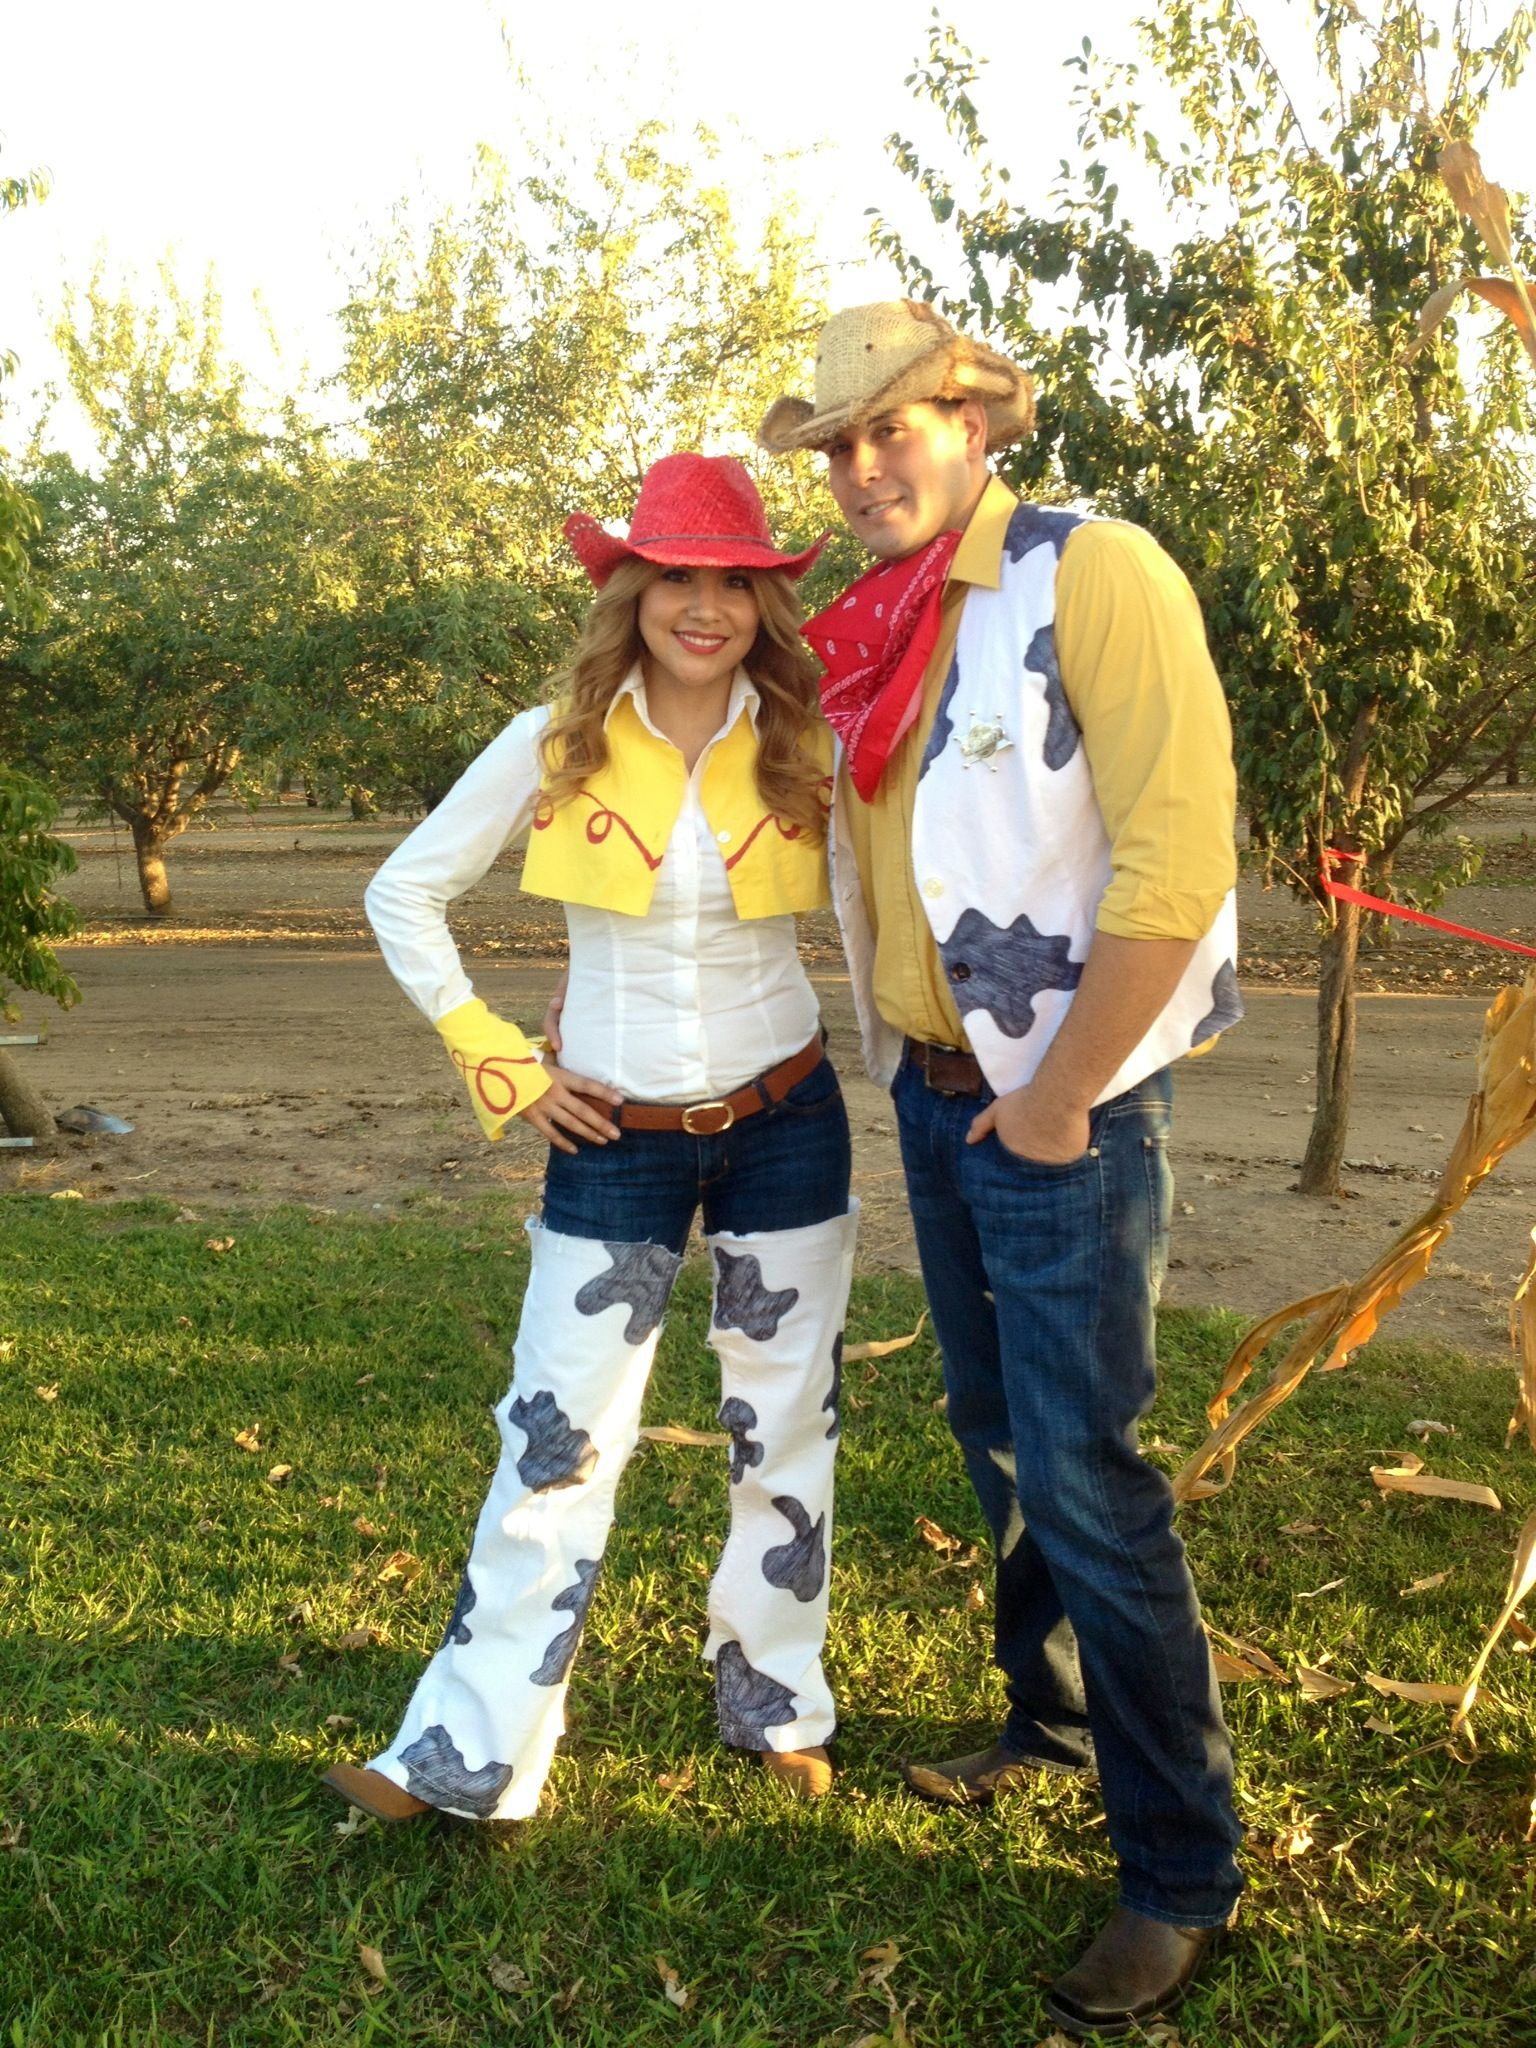 Diy jessie and woody costumes halloween costumes pinterest diy jessie and woody costumes solutioingenieria Gallery